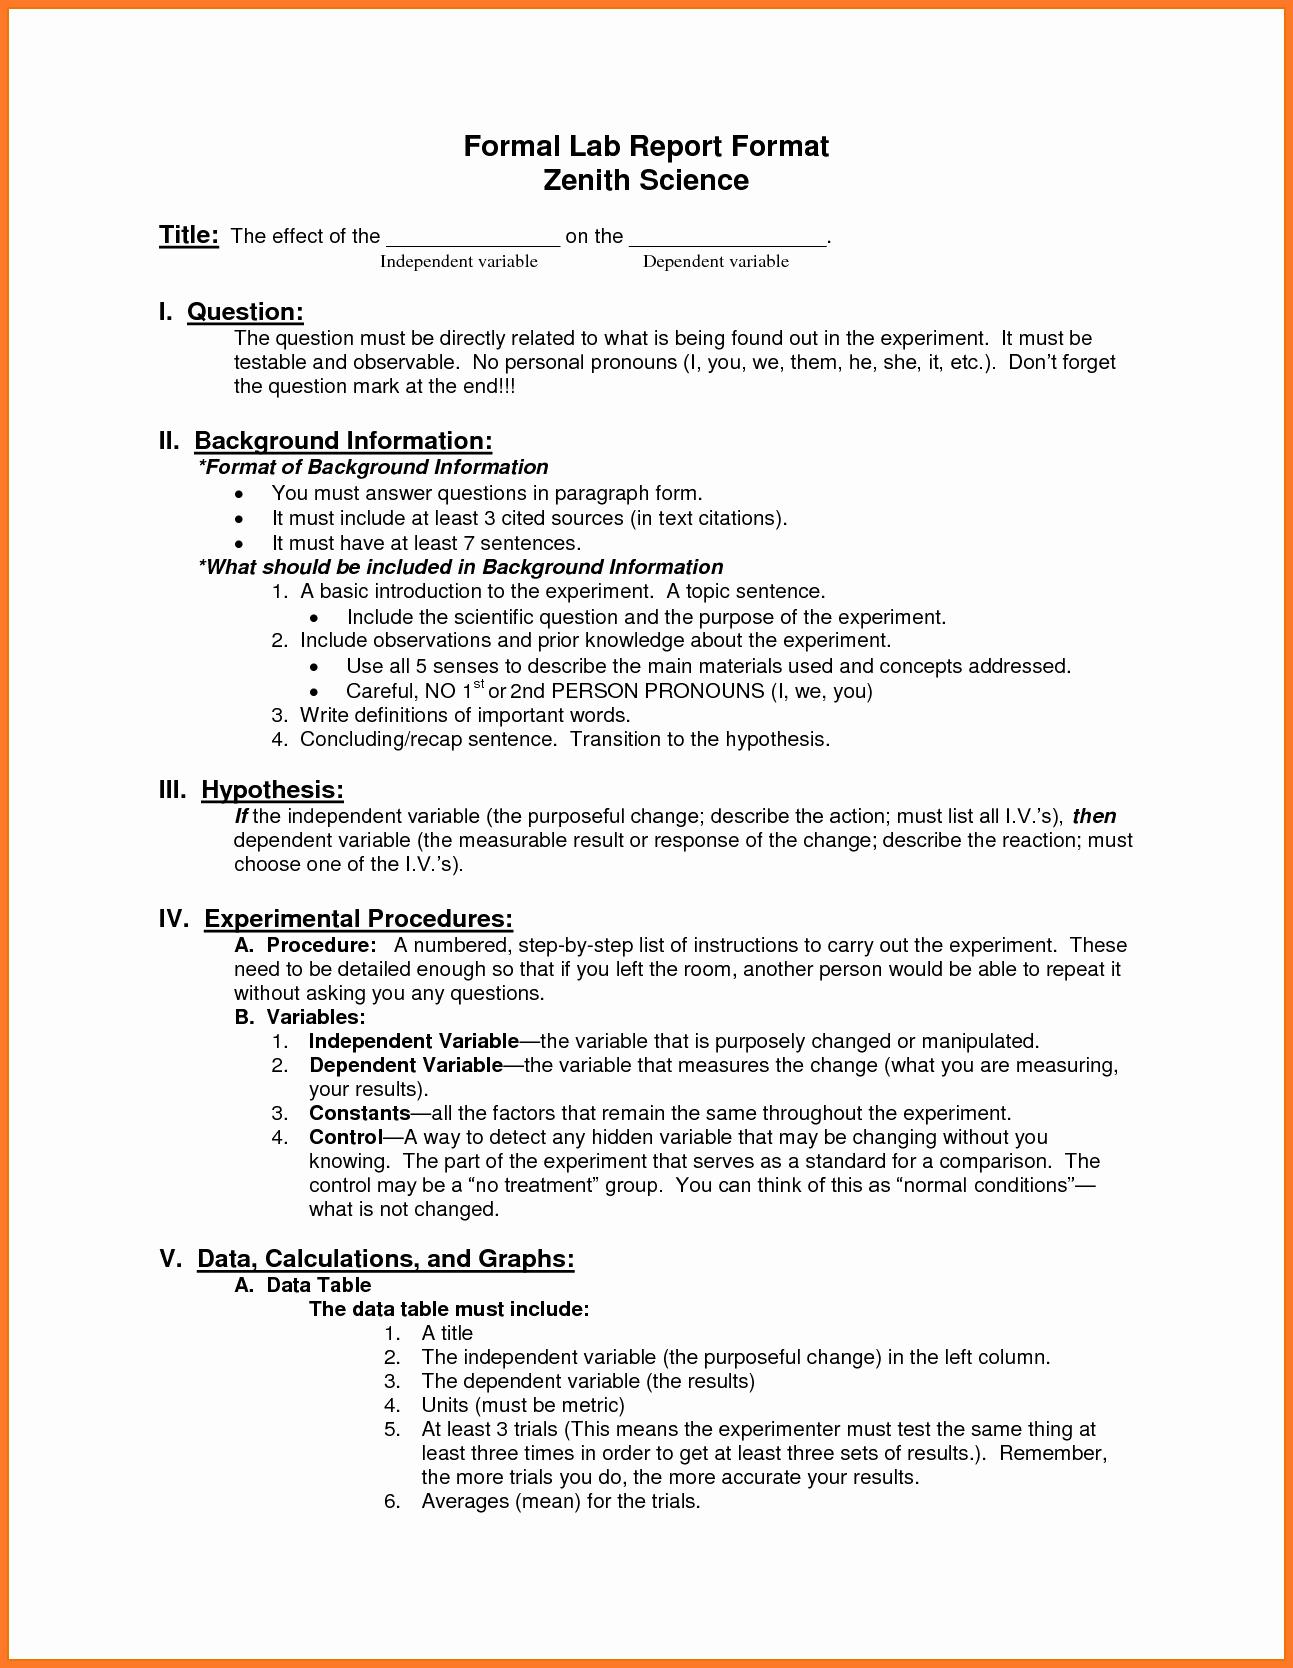 Formal Lab Report Template Luxury Report format Portablegasgrillweber